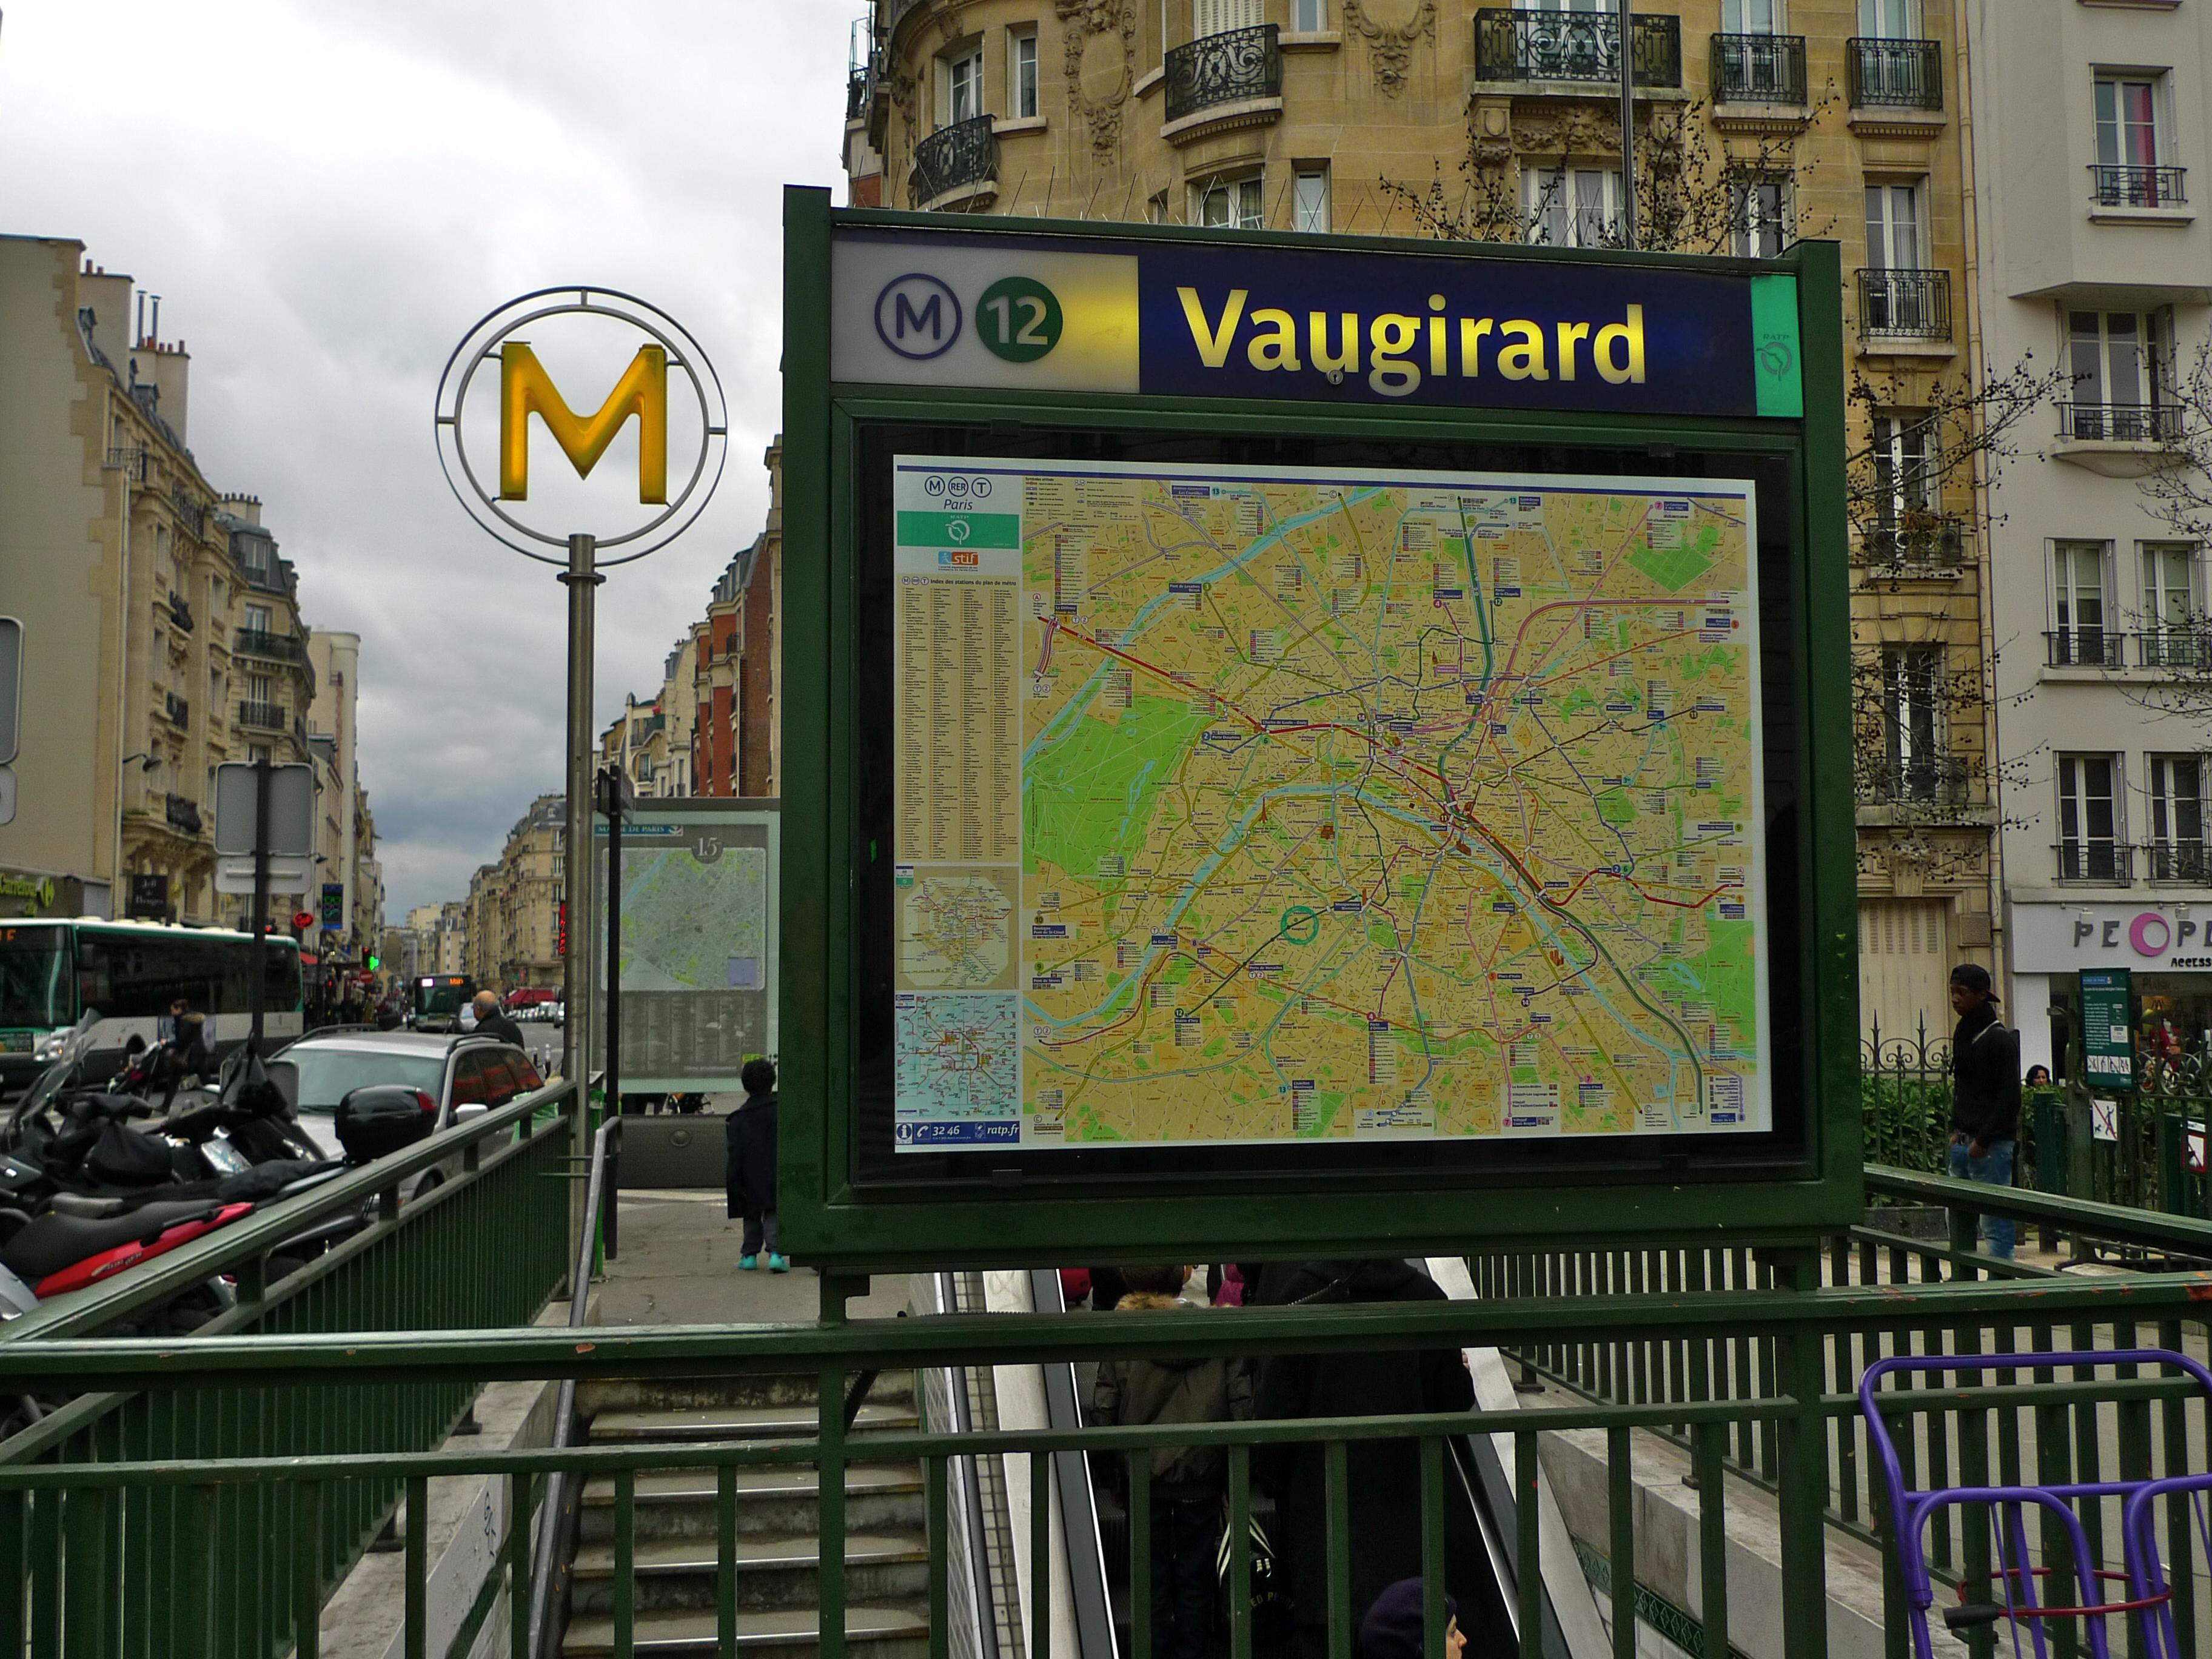 Rue de vaugirard soundlandscapes 39 blog - Porte de versailles metro ...